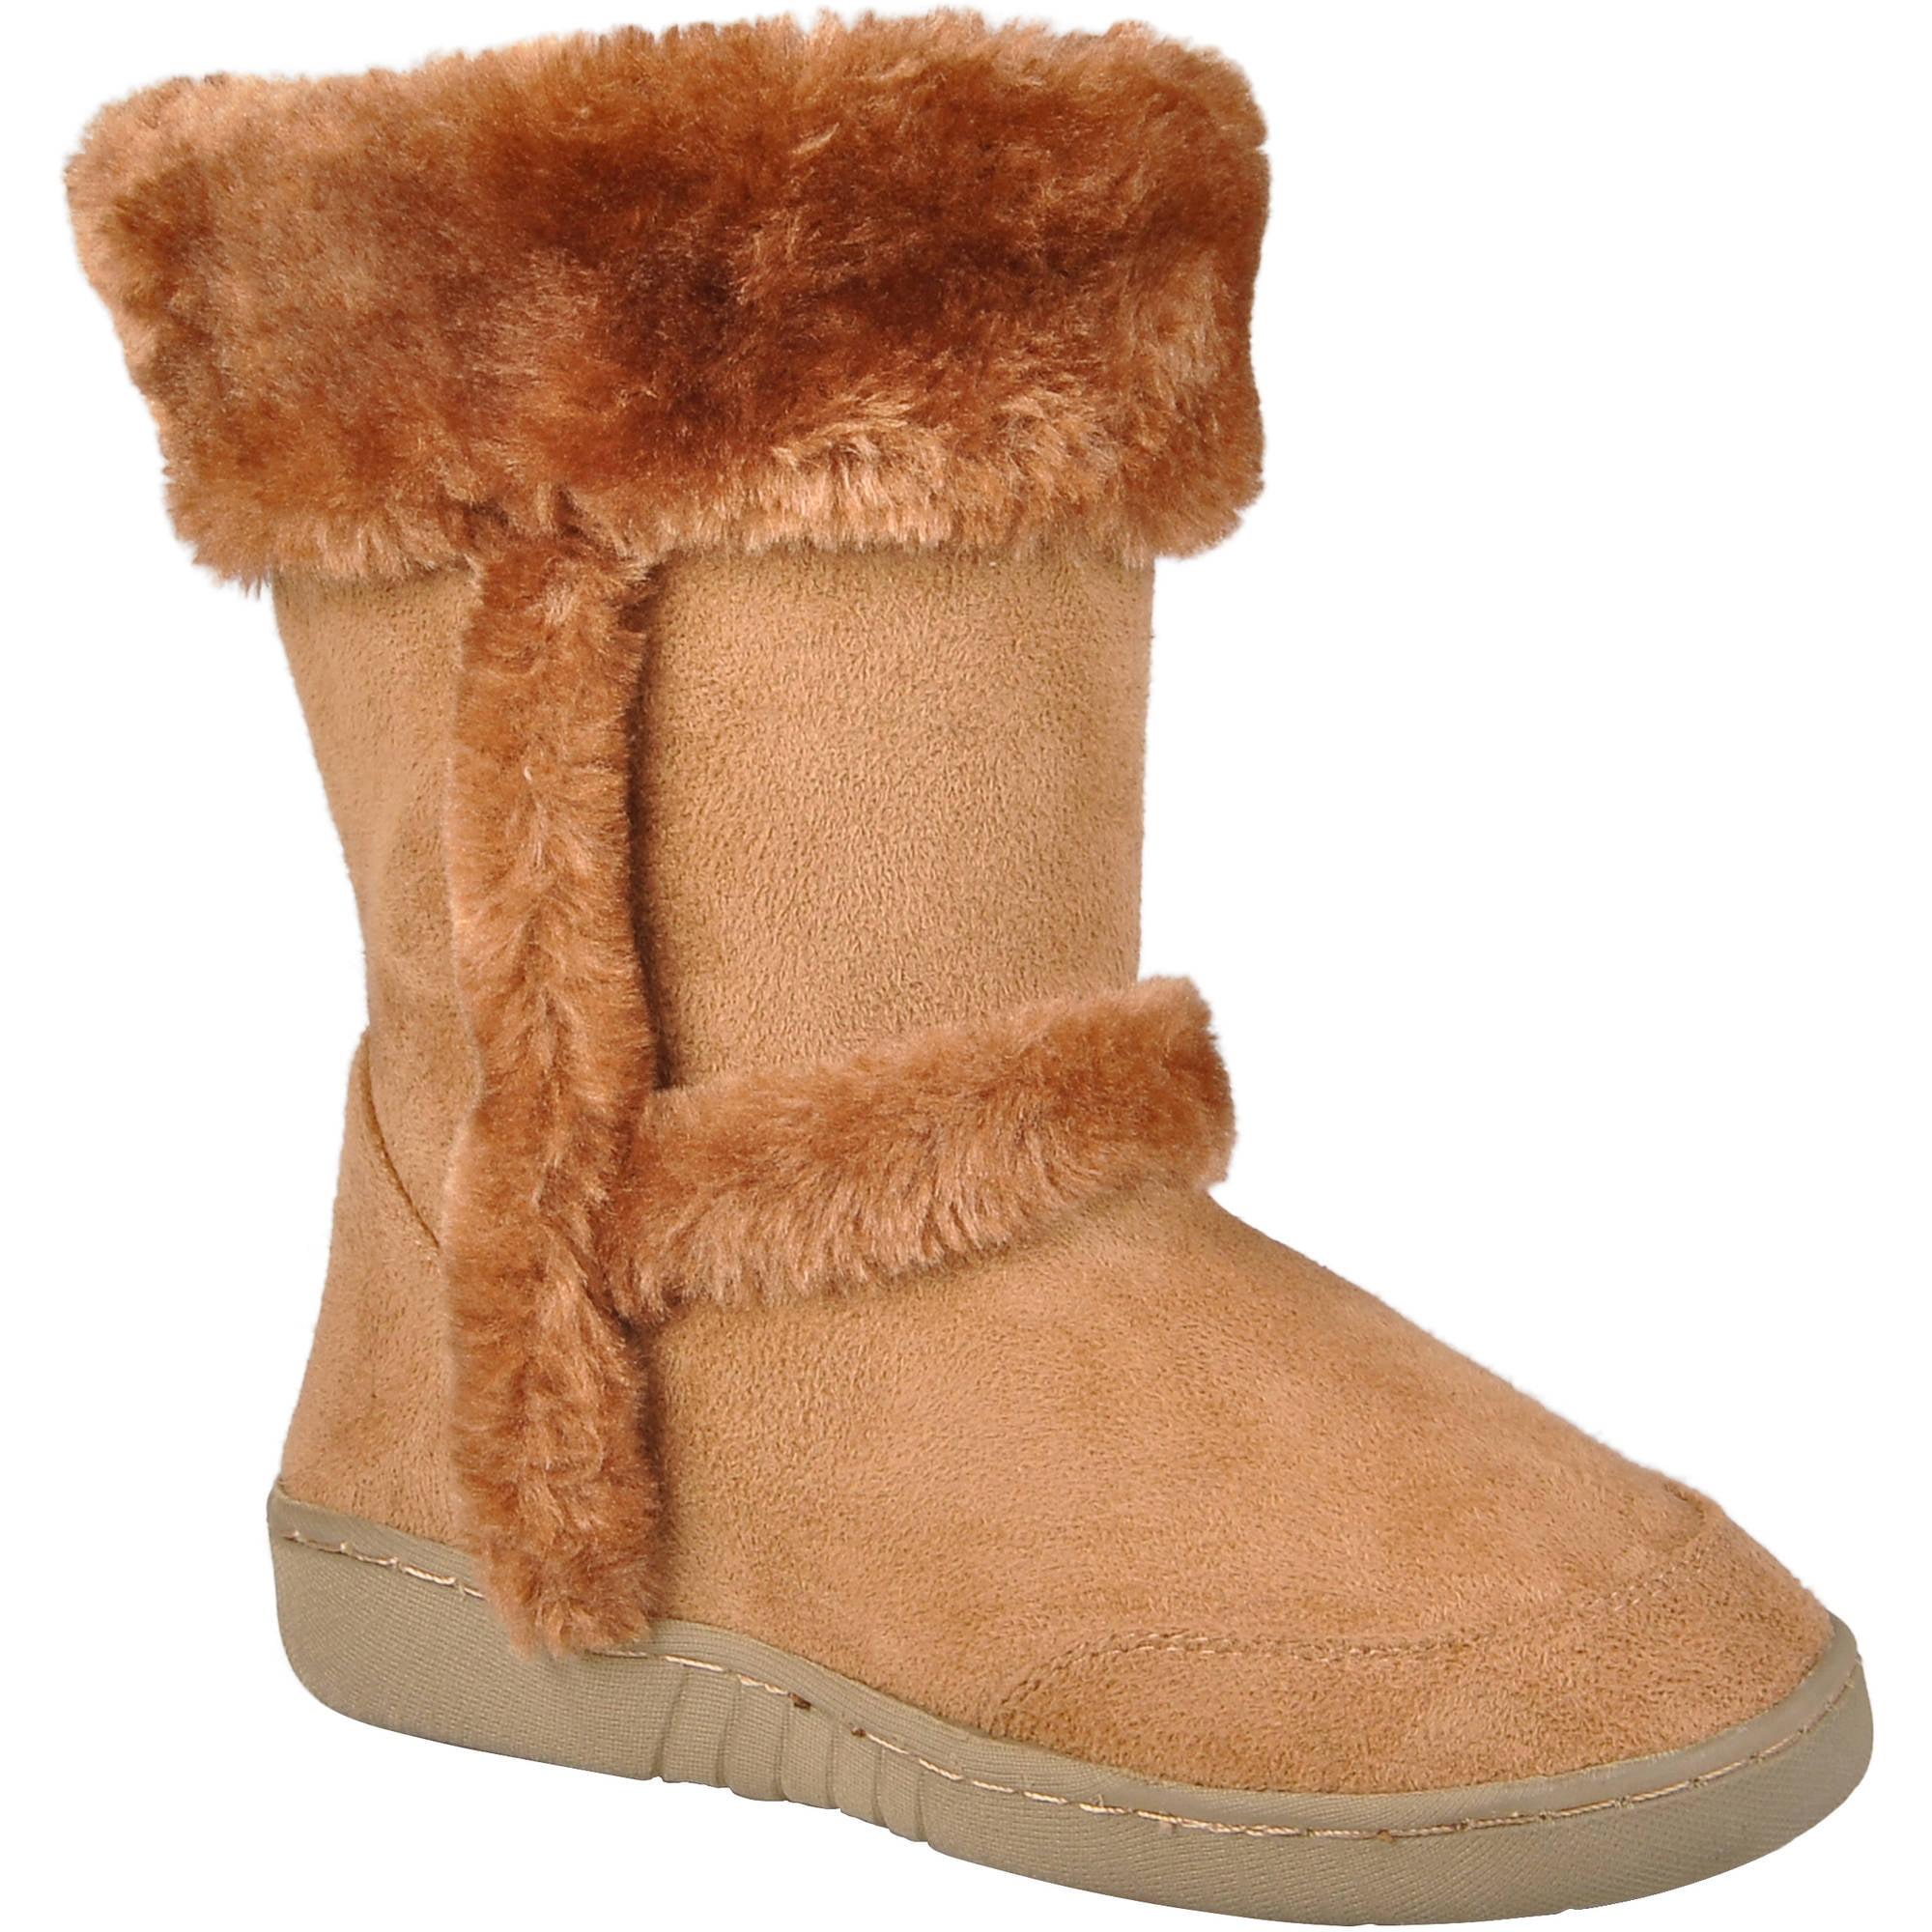 Brinley Co Girls Faux Fur Trim Boots